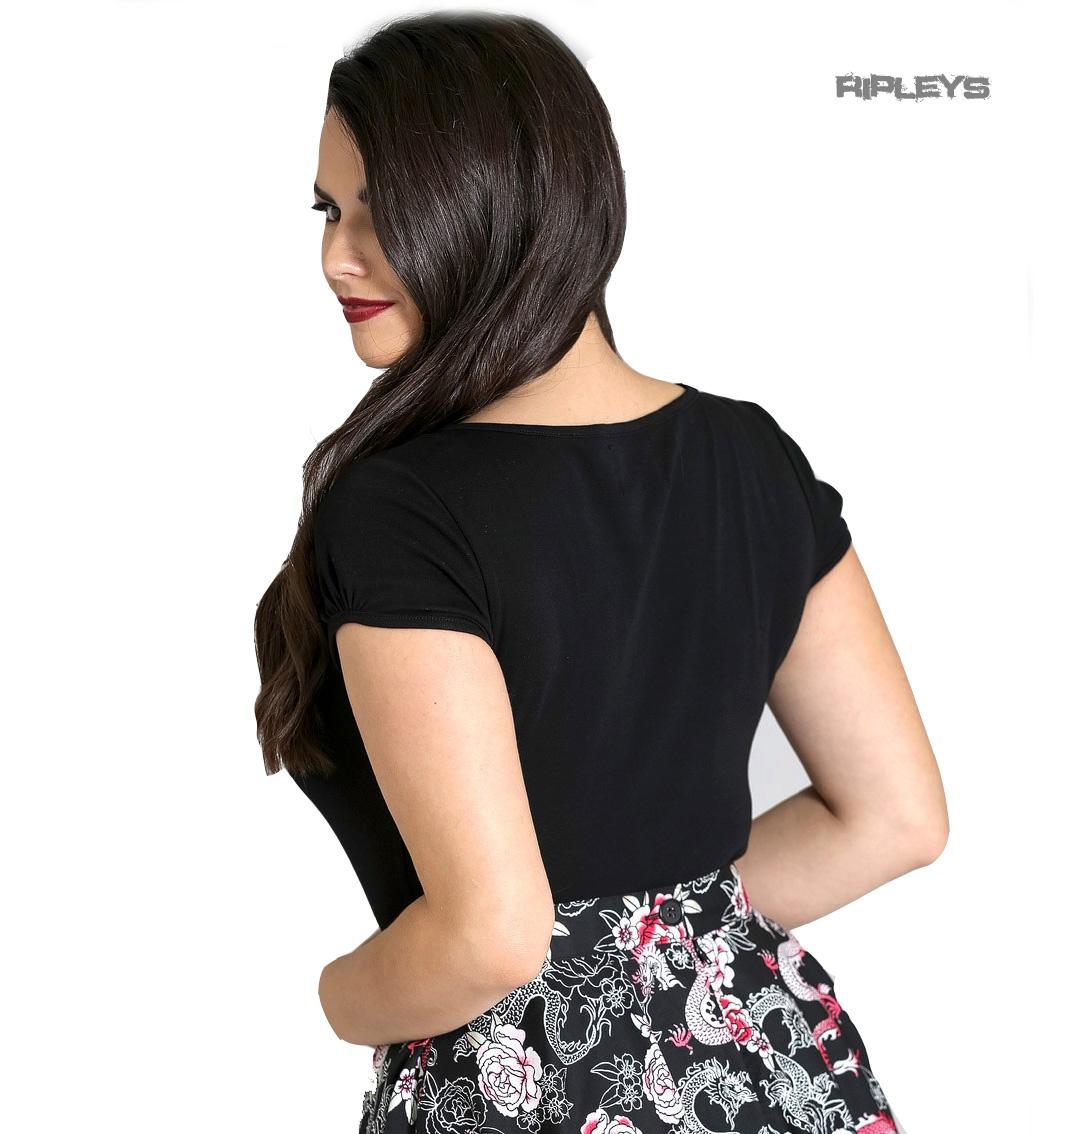 Hell-Bunny-Shirt-50s-Rockabilly-Top-MIA-Plain-Black-Short-Sleeves-All-Sizes thumbnail 4